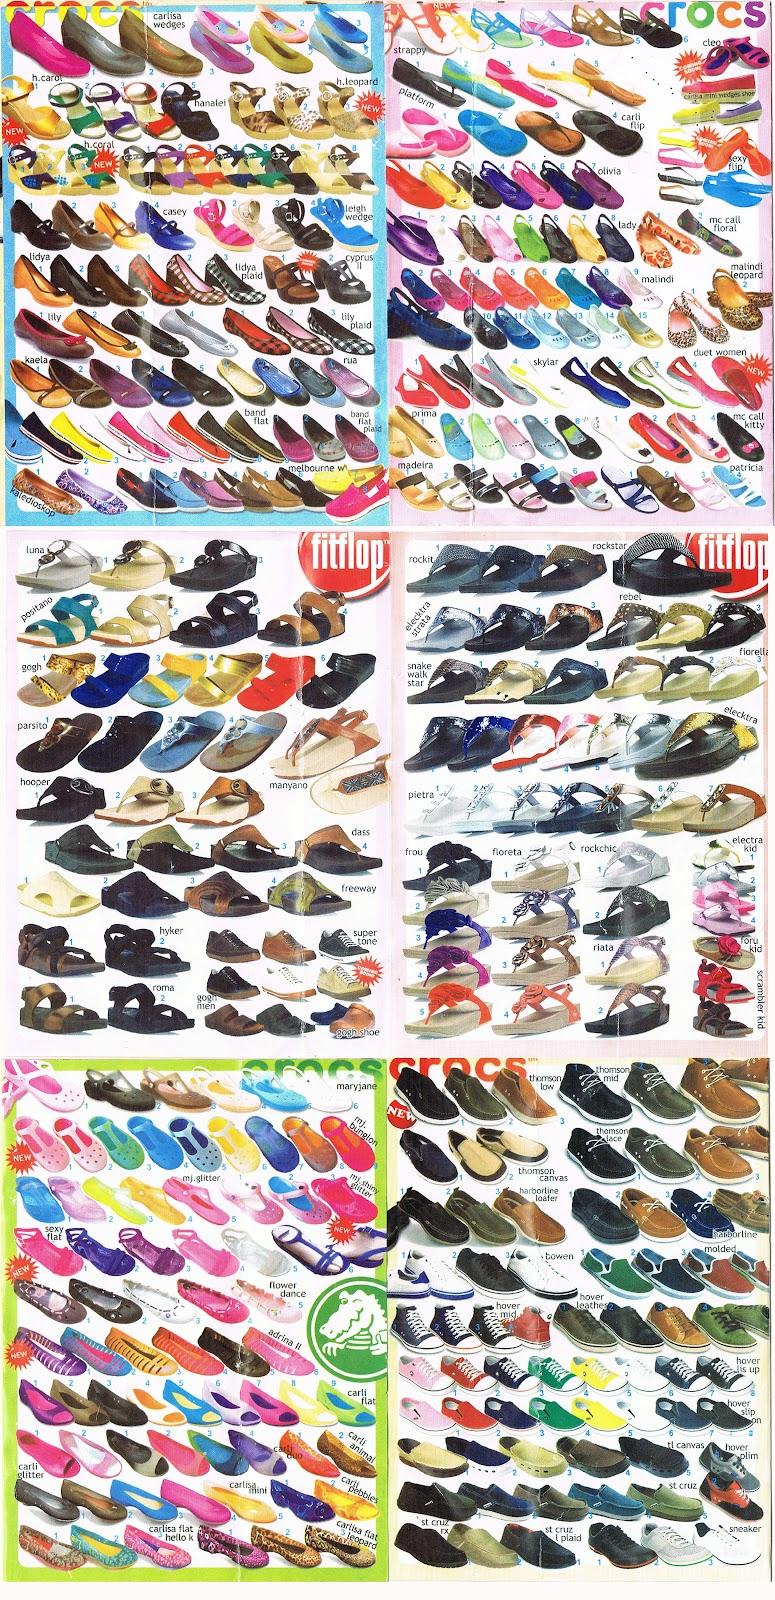 Daftar Katalog lengkap Sepatu Crocs : Wanita - CROCS ...